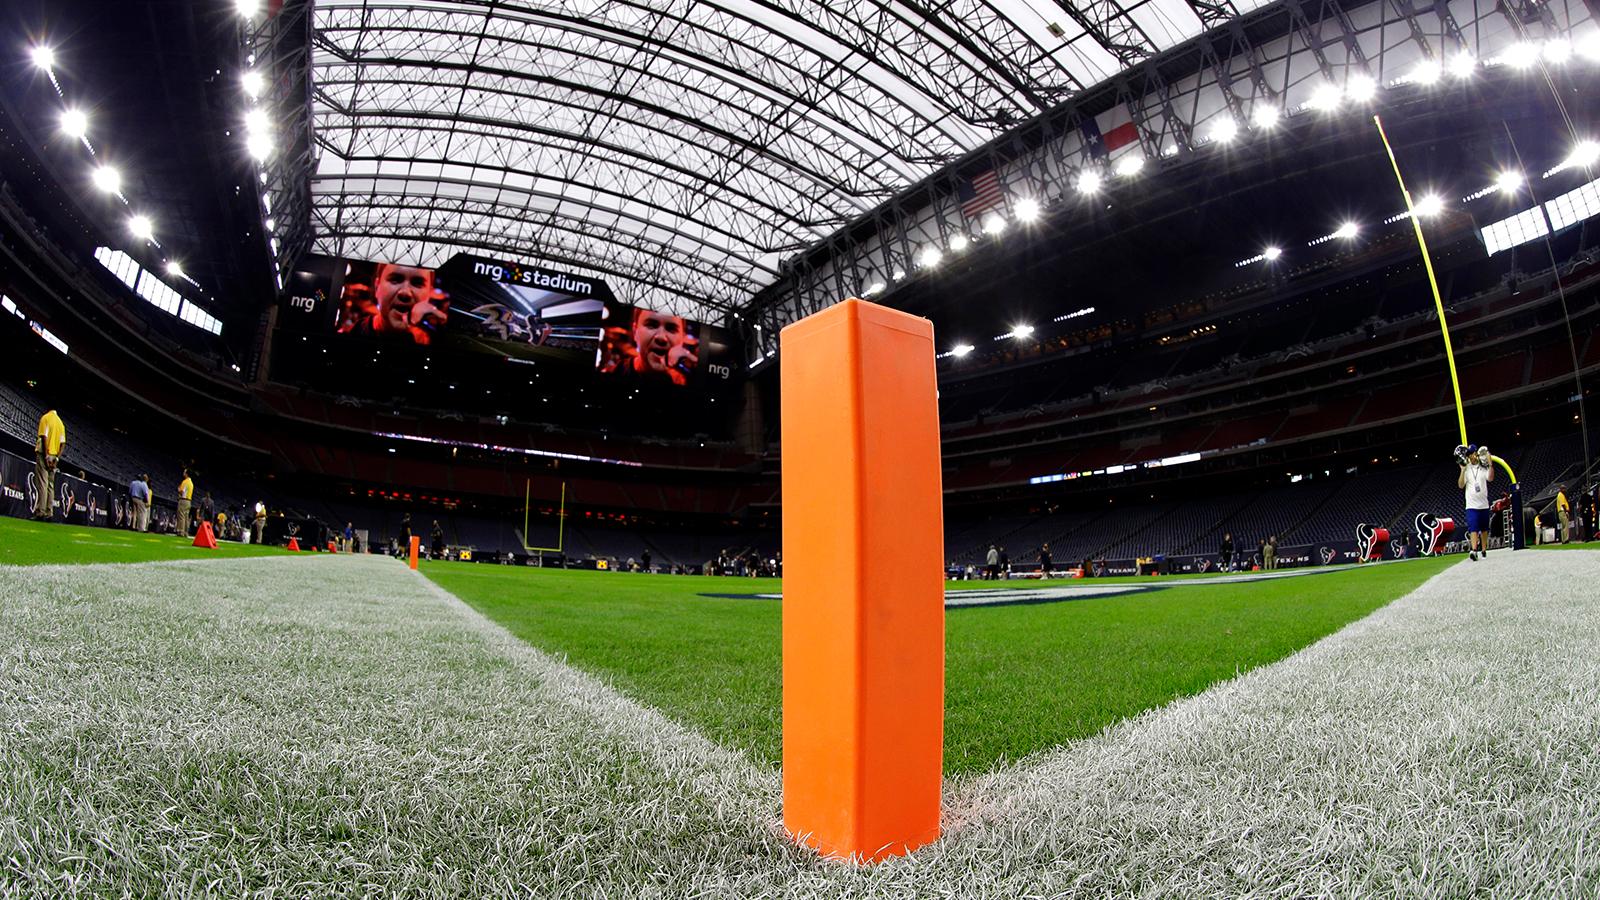 Corner of a football field